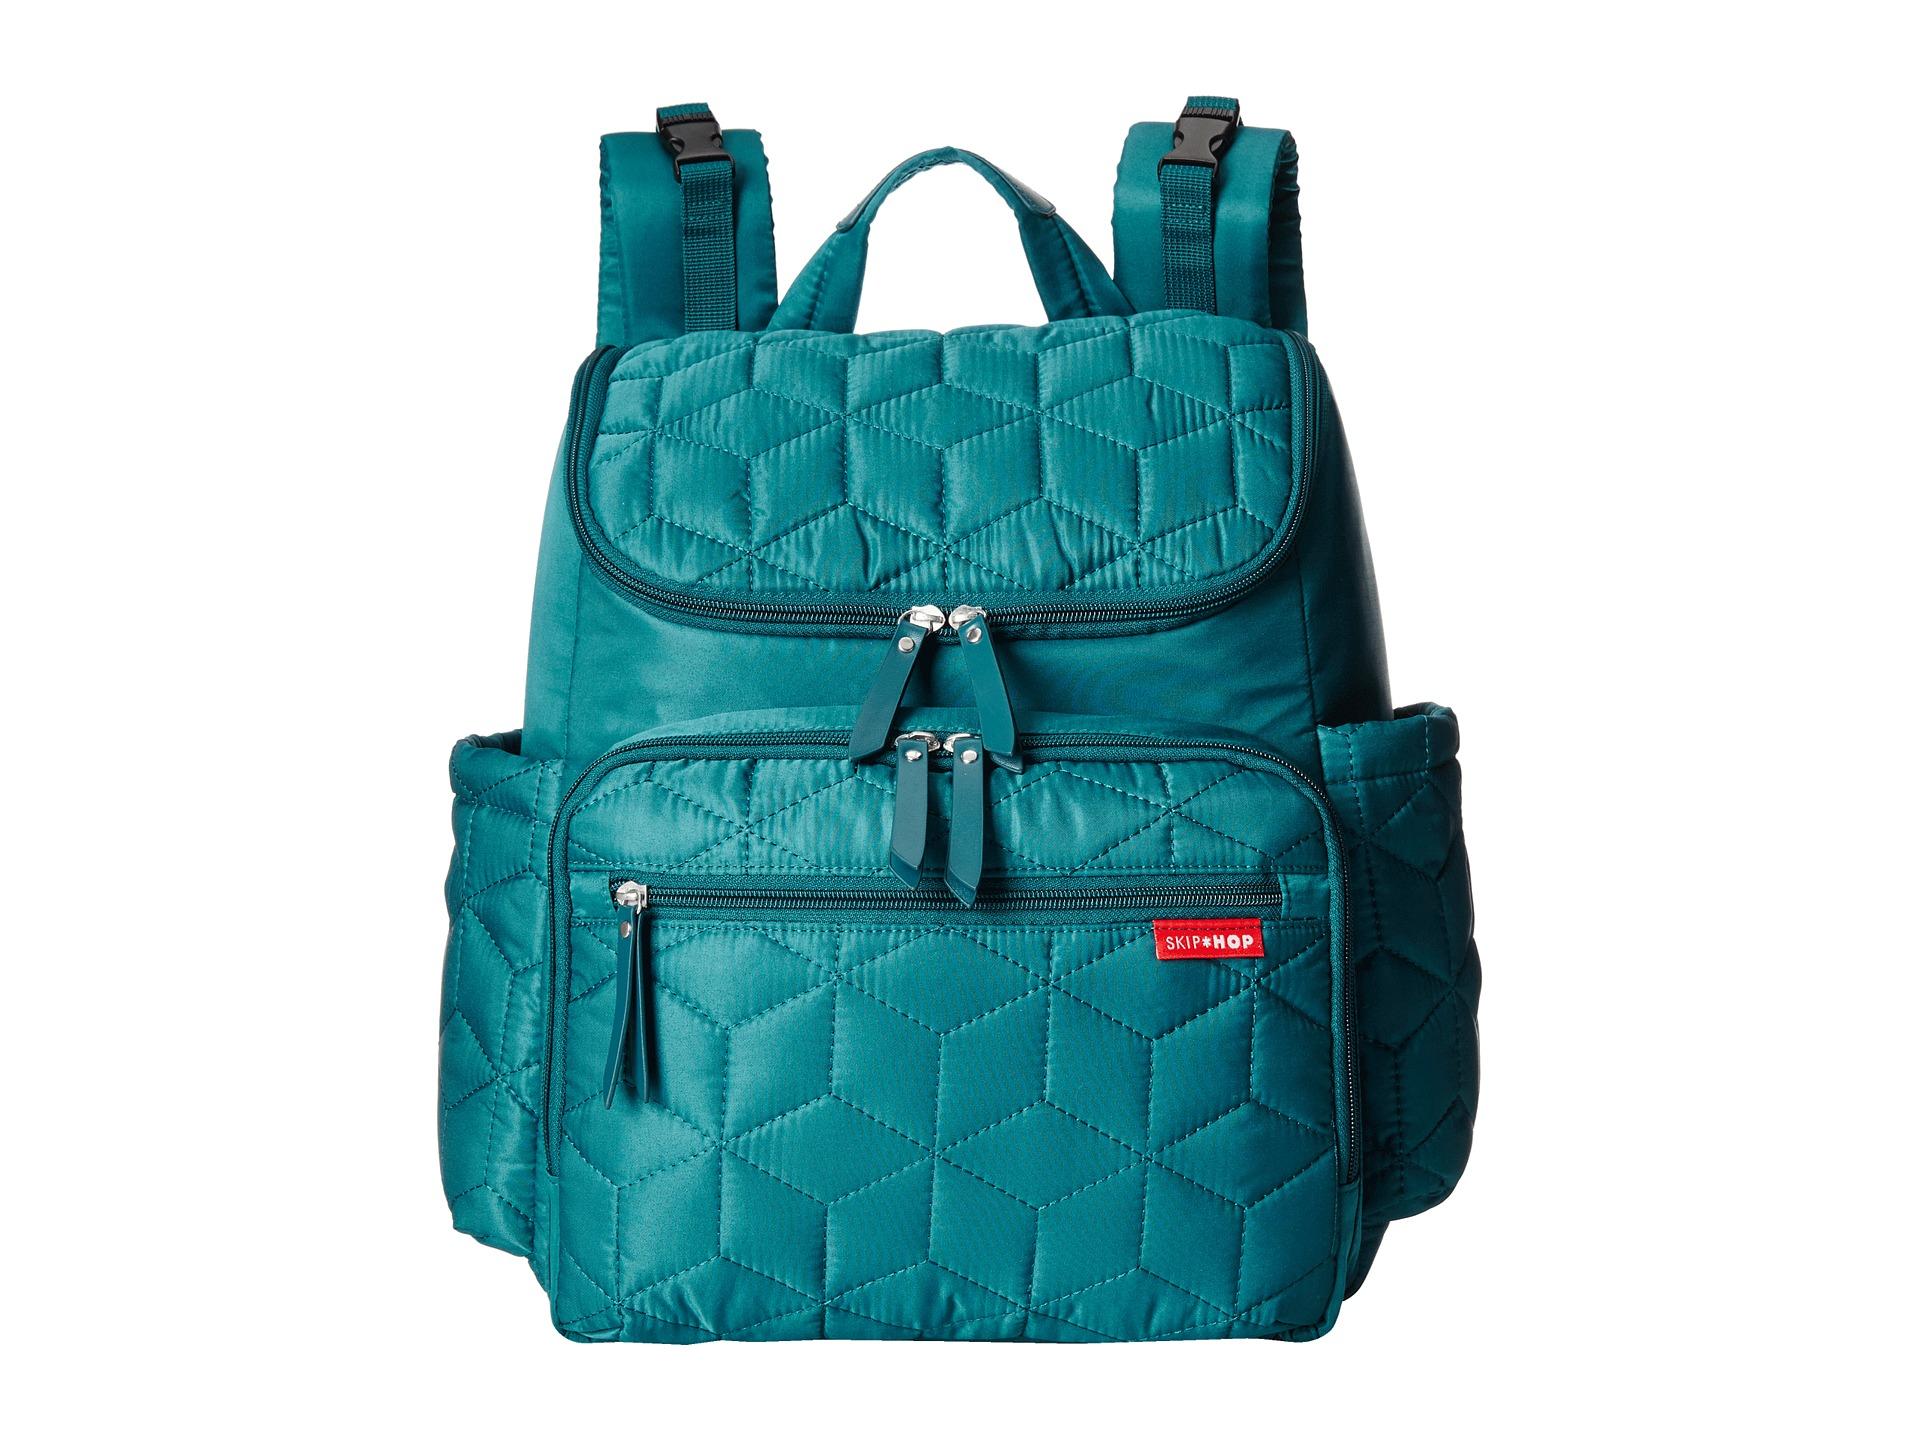 skip hop forma backpack peacock free shipping both ways. Black Bedroom Furniture Sets. Home Design Ideas